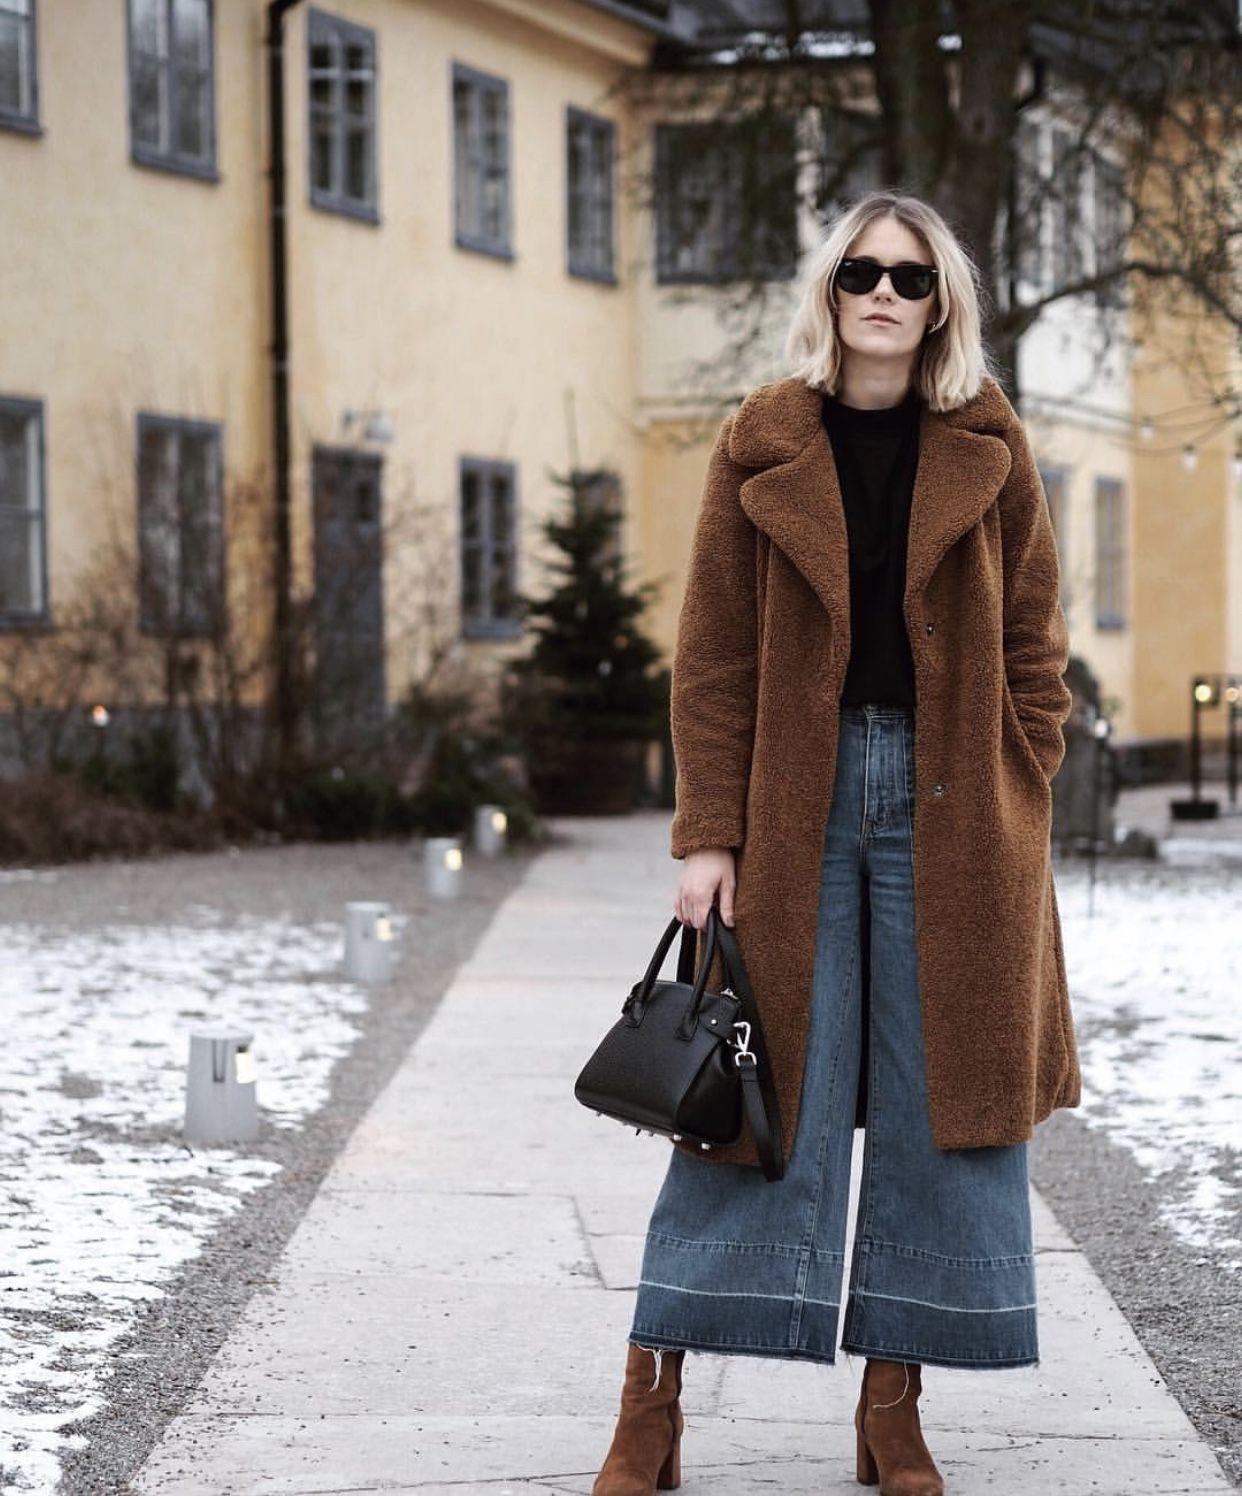 f90259f0dbce Norweigian blogger Sara Strand wearing DECADENT Adele tiny shopper in black.